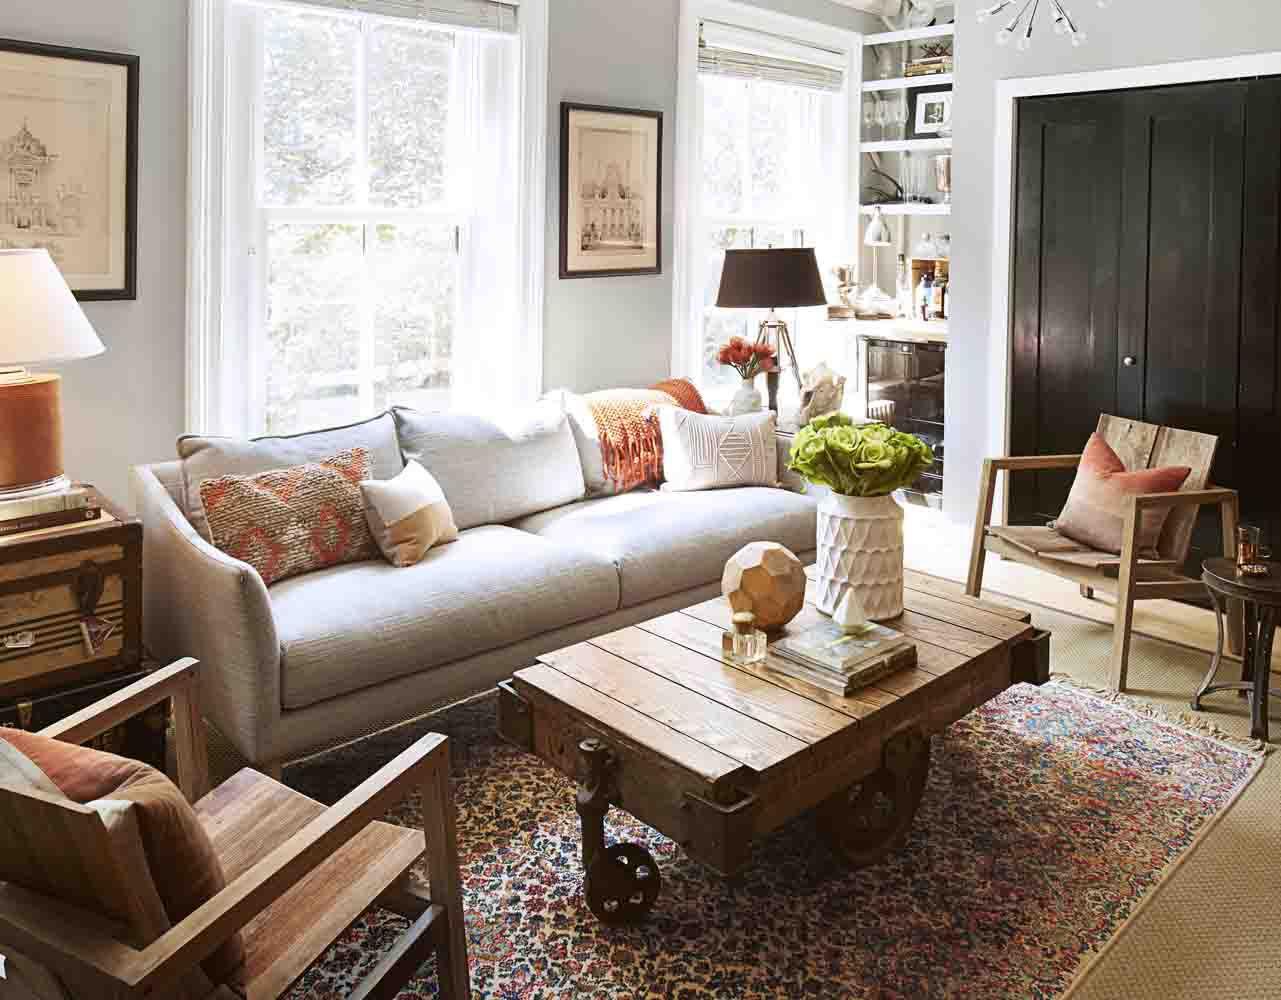 Living room decor ideas 51 best living room ideas - stylish living room decor designs XHGCDSX